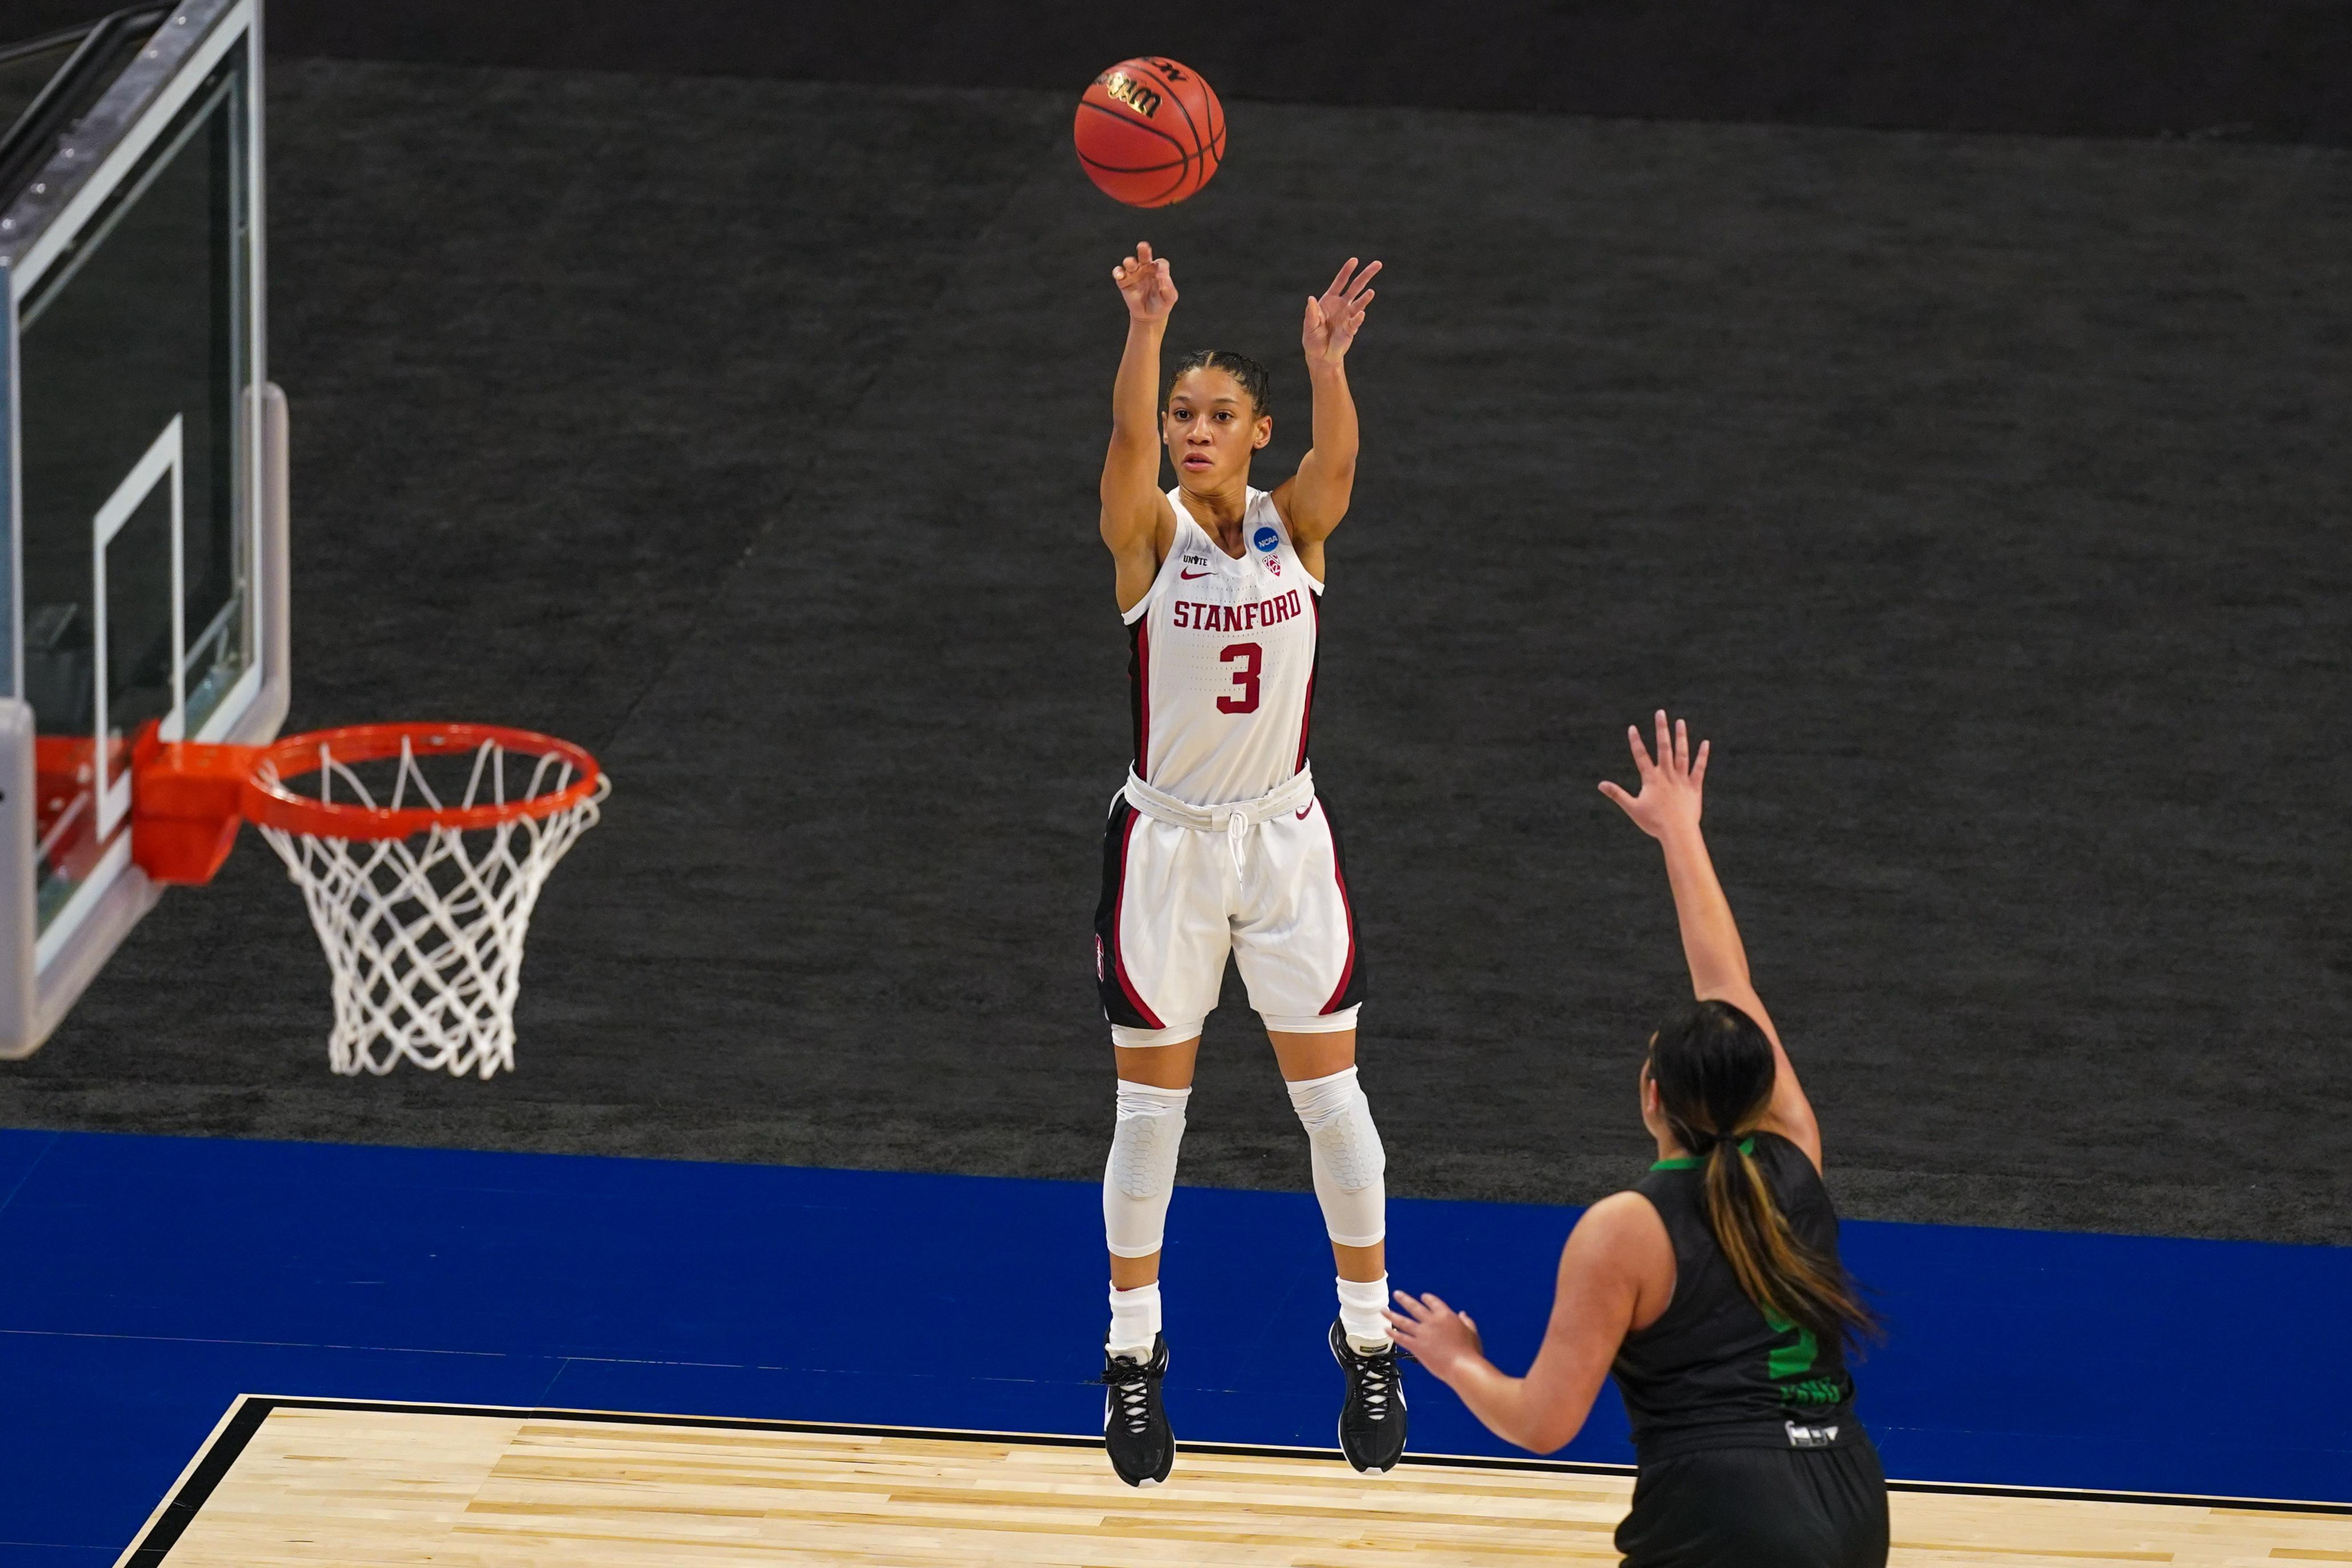 NCAA Womens Basketball: Utah Valley at Stanford